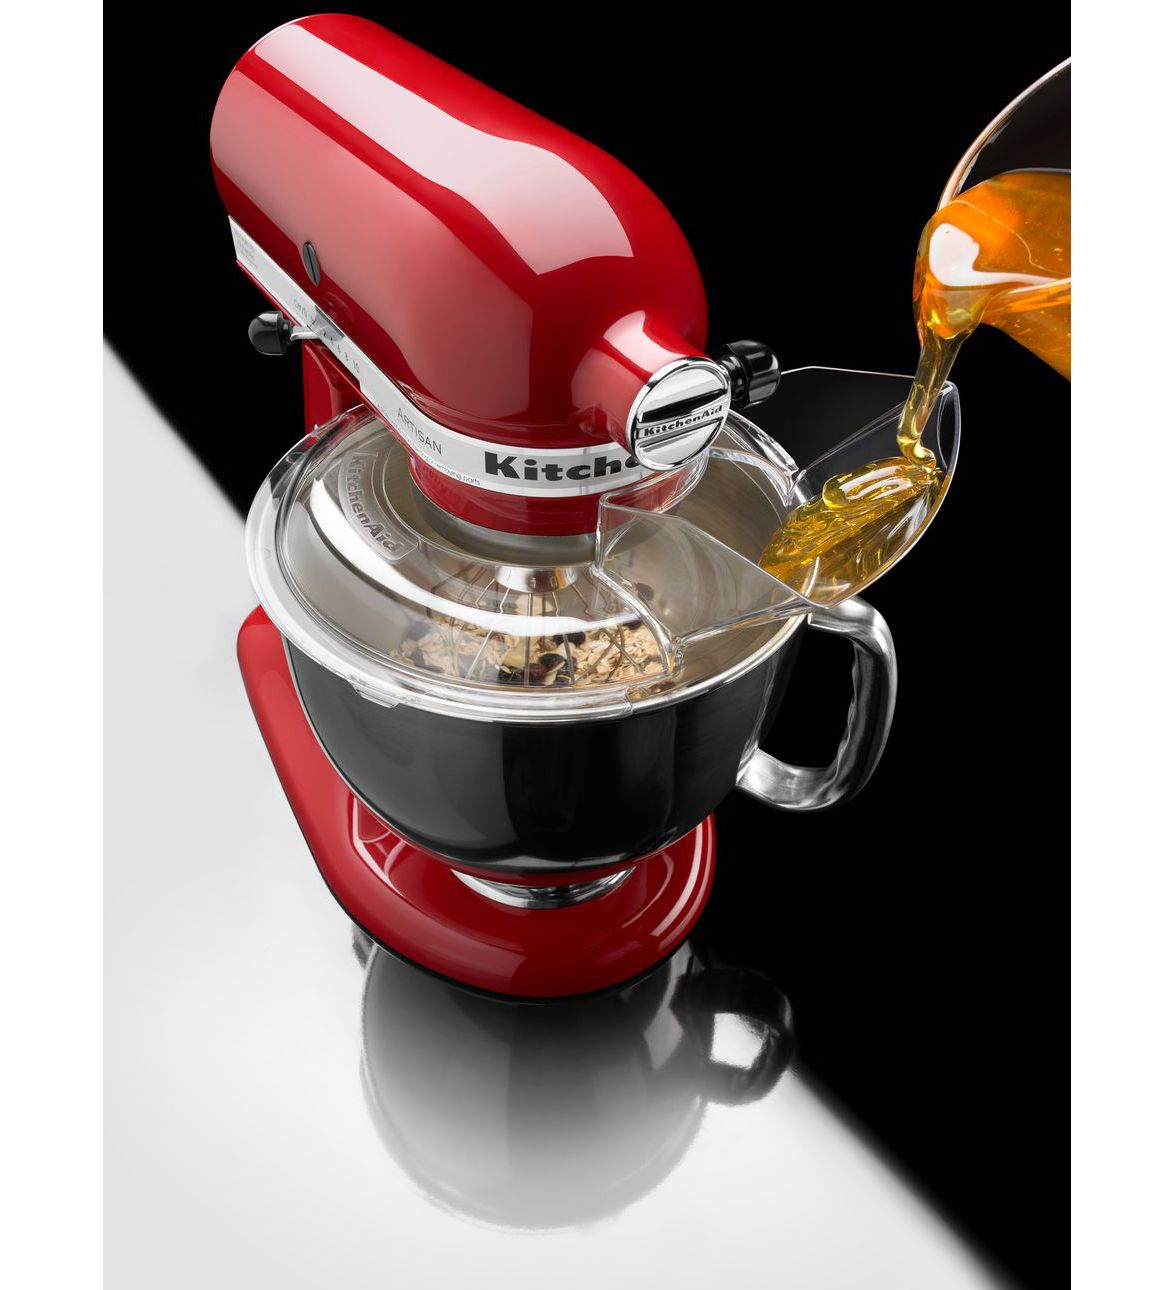 Kitchenaid 1 Piece Pouring Shield Master Technicians Ltd